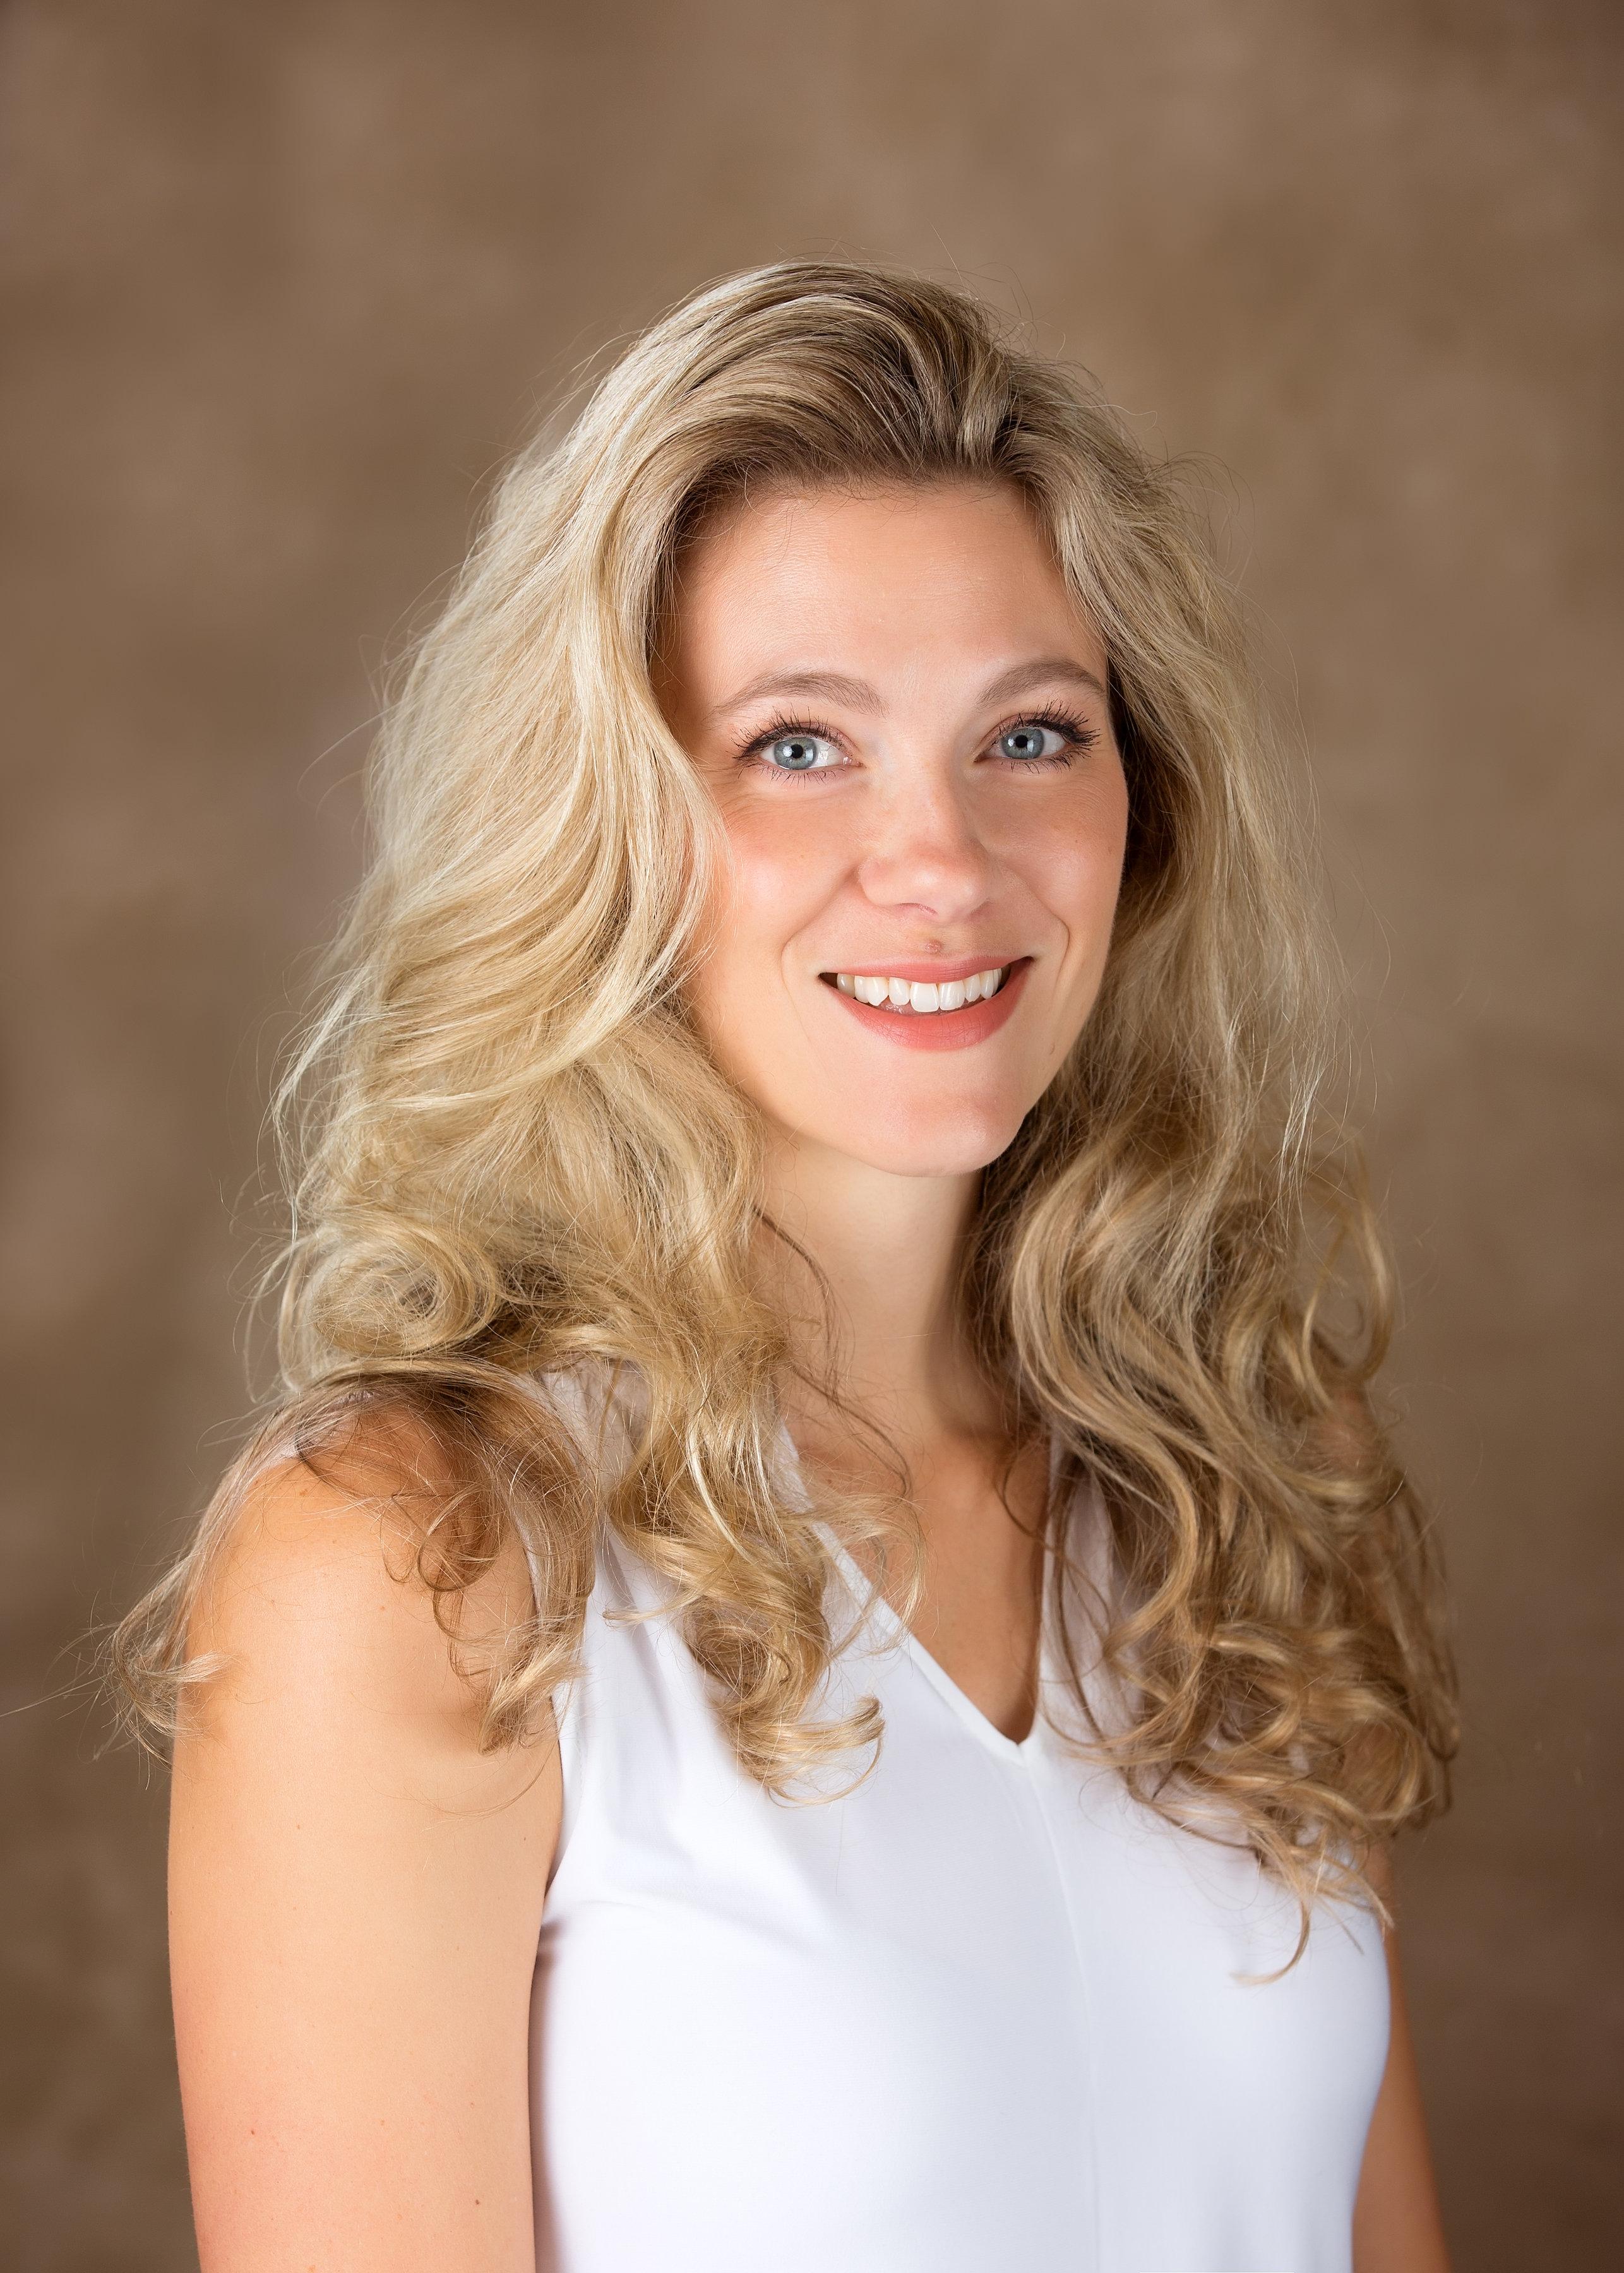 LeAnne Nielsen